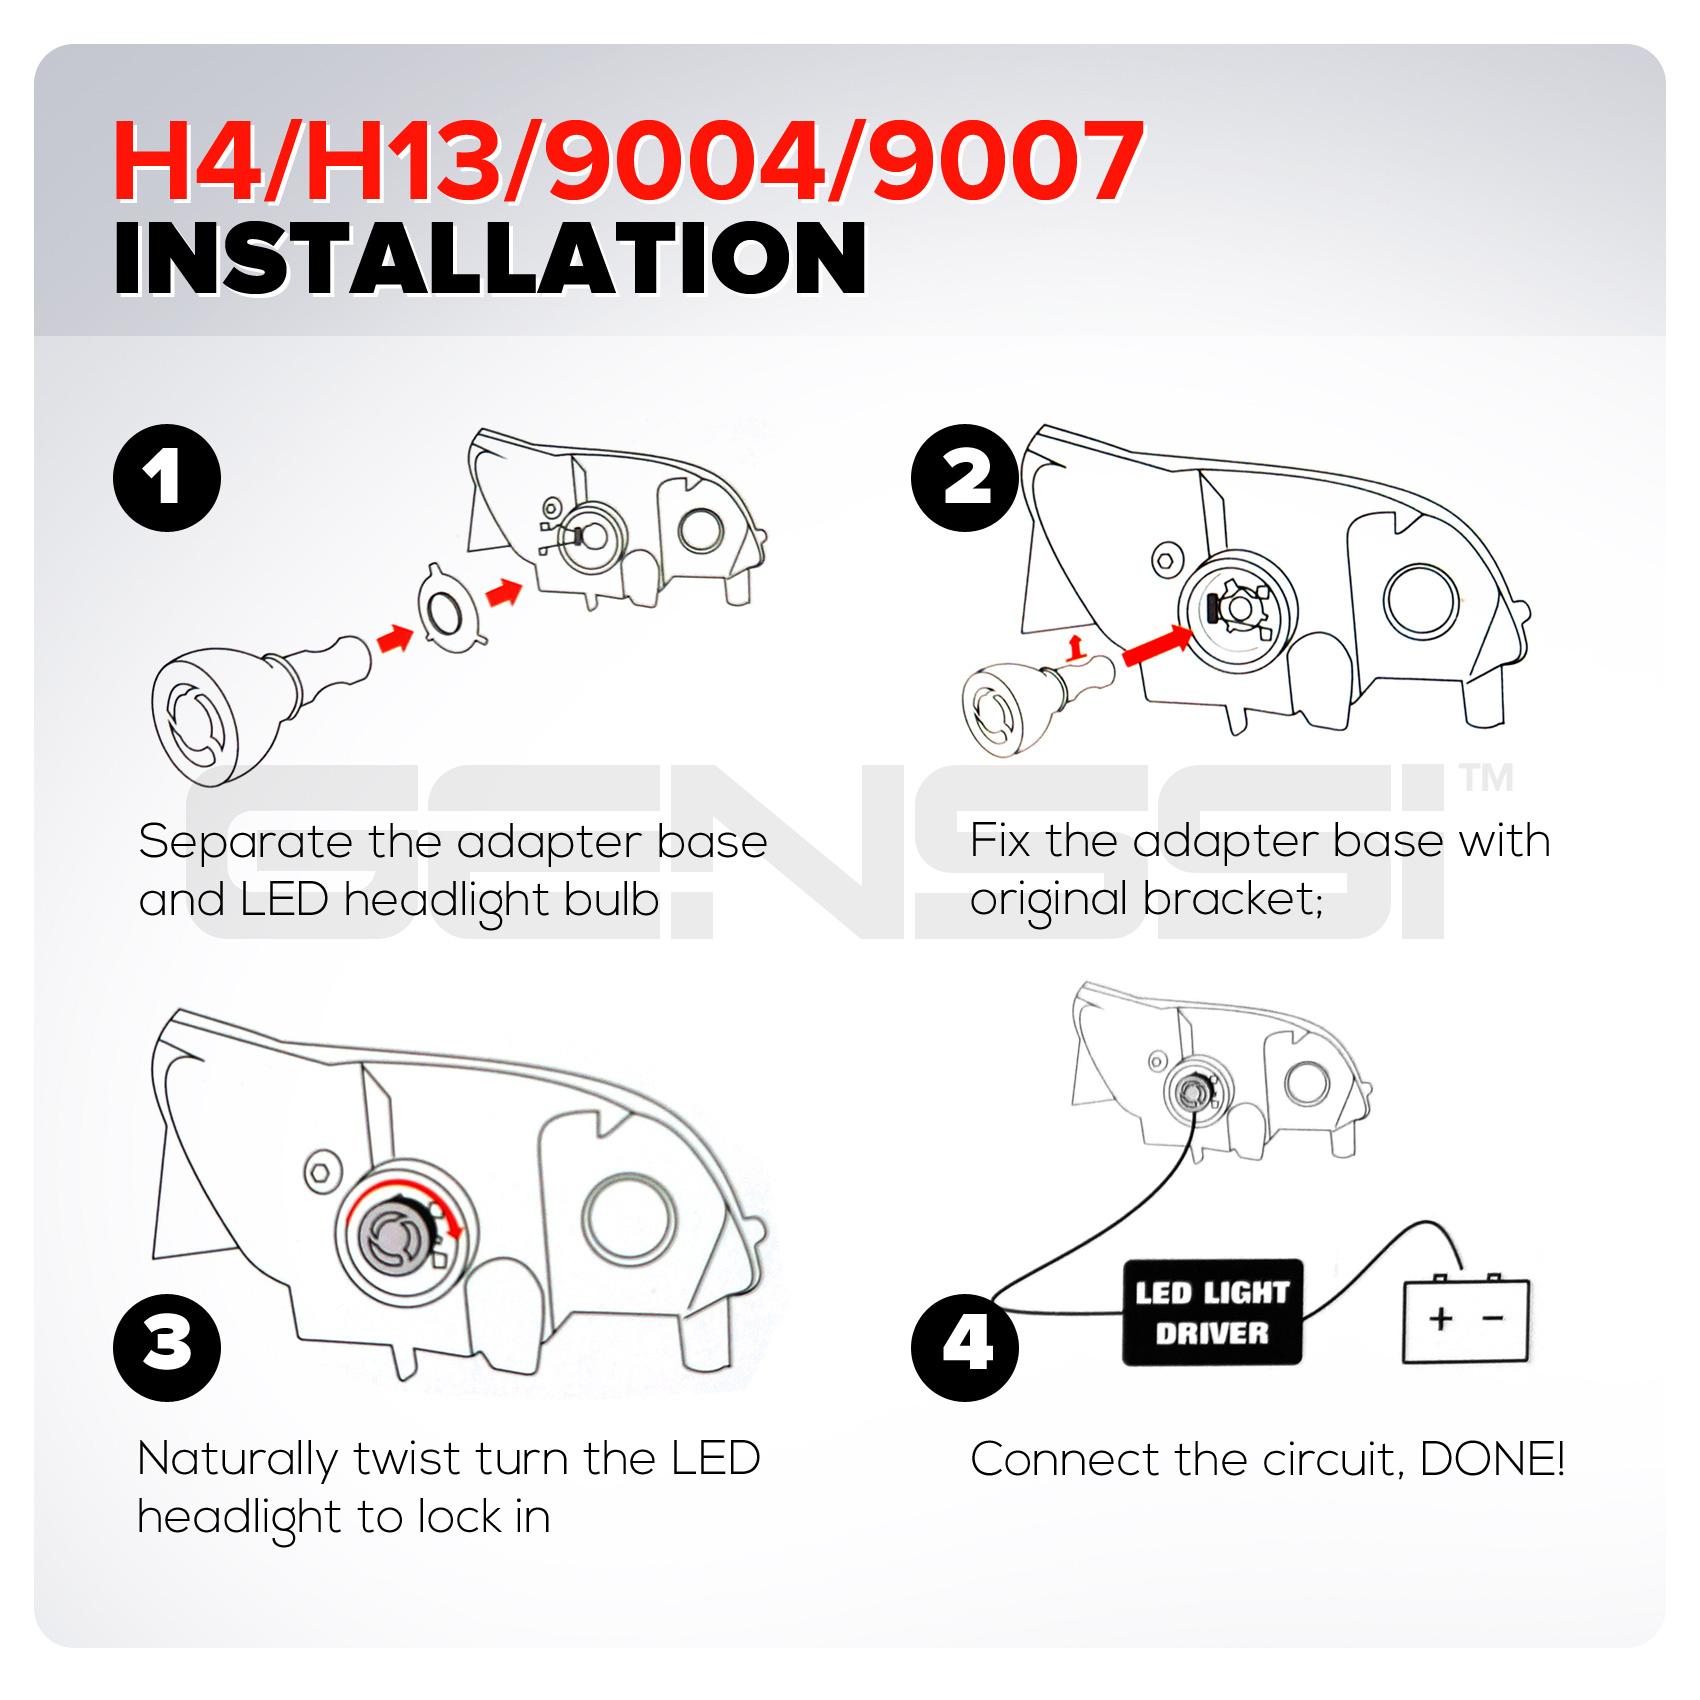 h4 halogen bulb wiring diagram 230 volt air conditioner h13 headlight